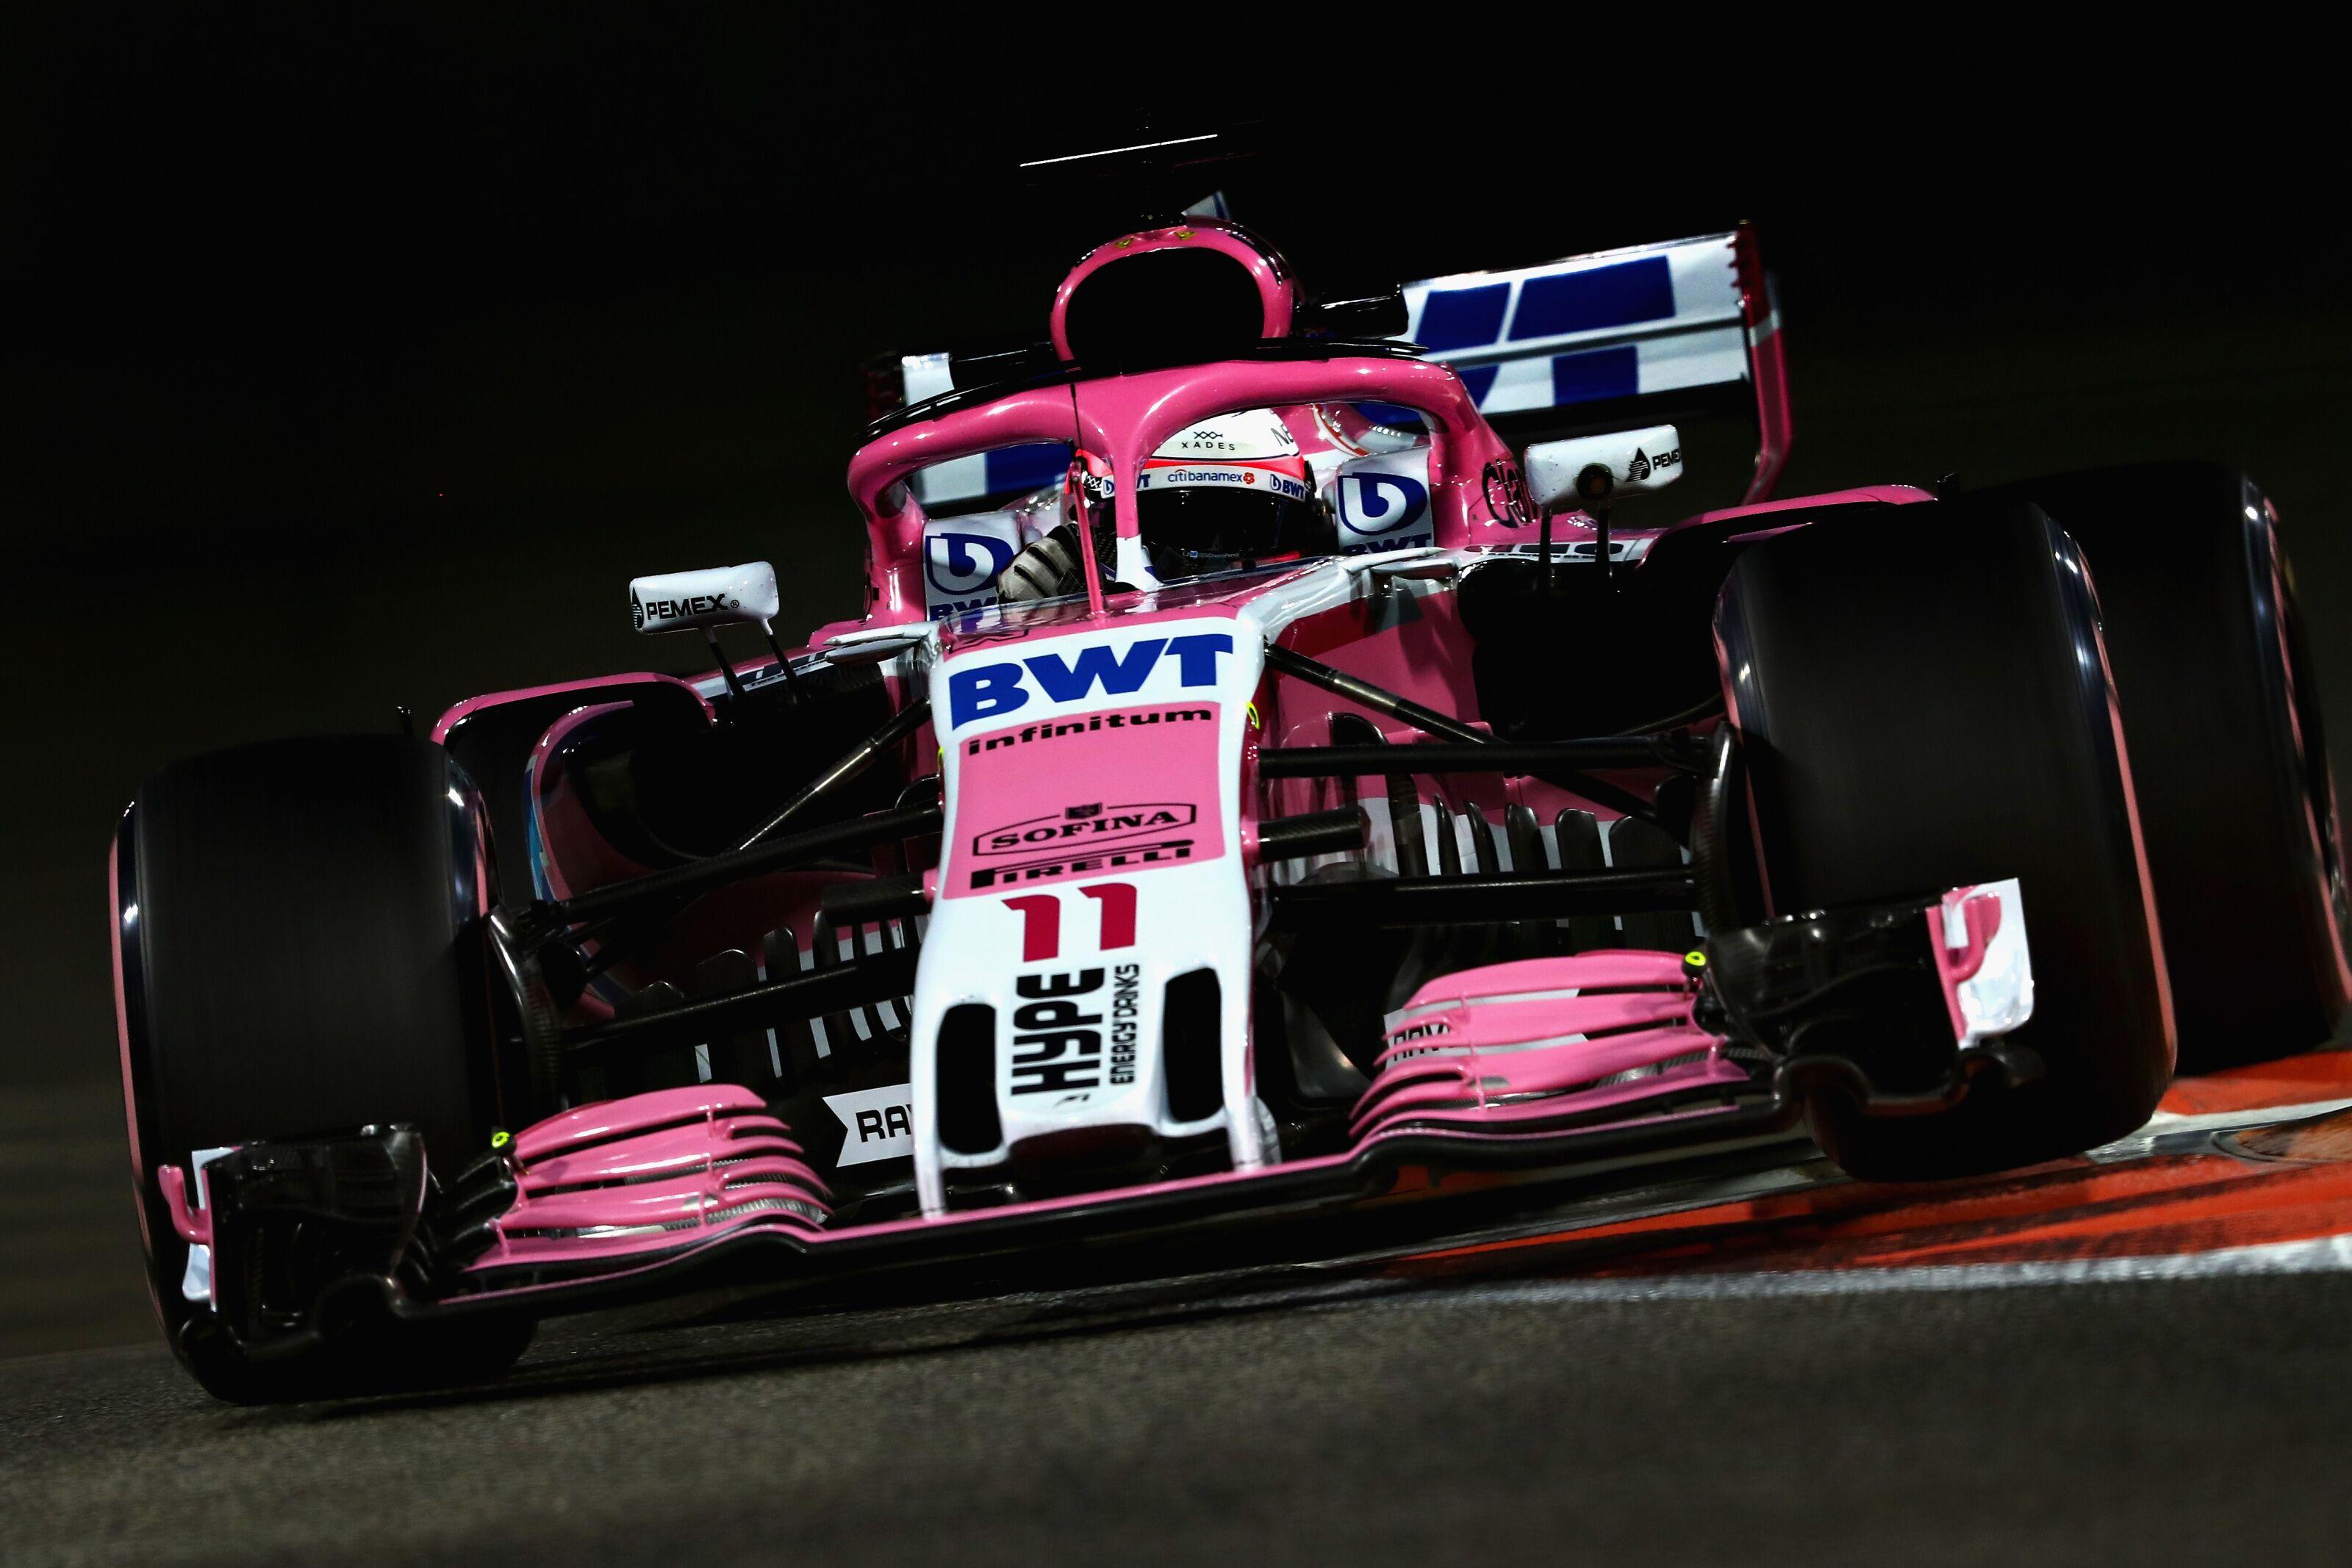 Formula 1: Racing Point name to change before 2019 season